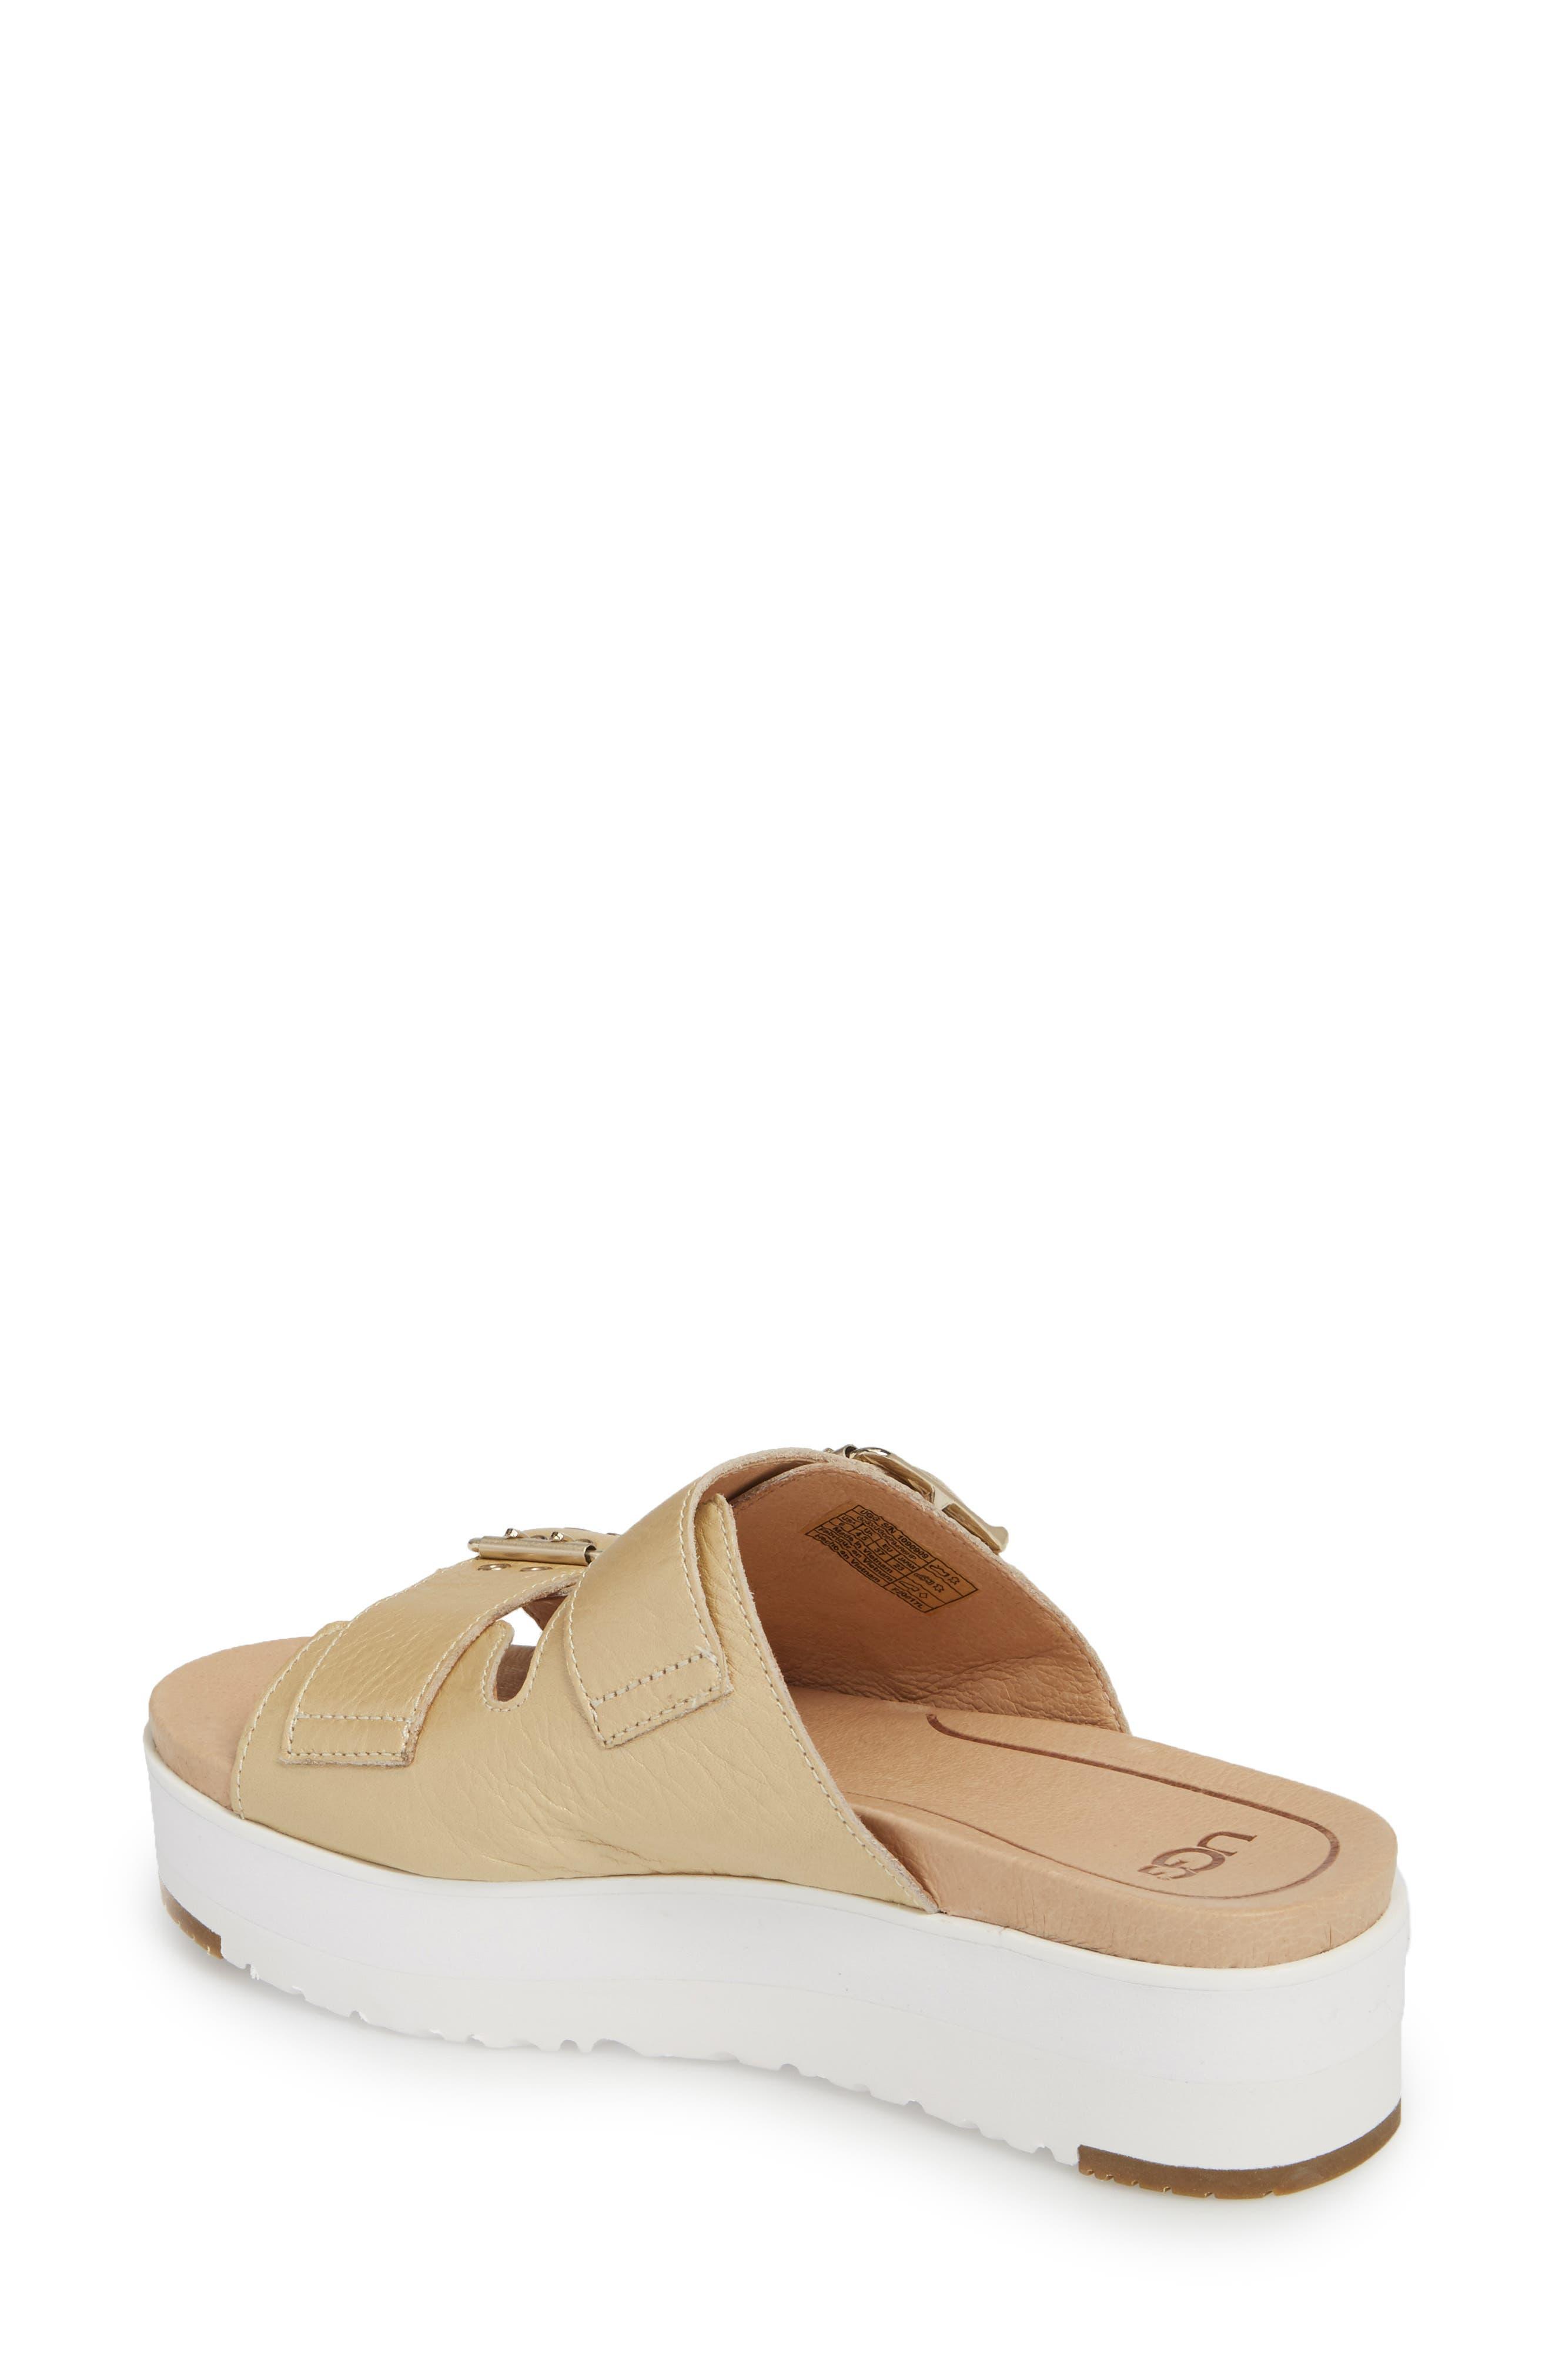 Cammie Platform Sandal,                             Alternate thumbnail 2, color,                             Gold Patent Leather